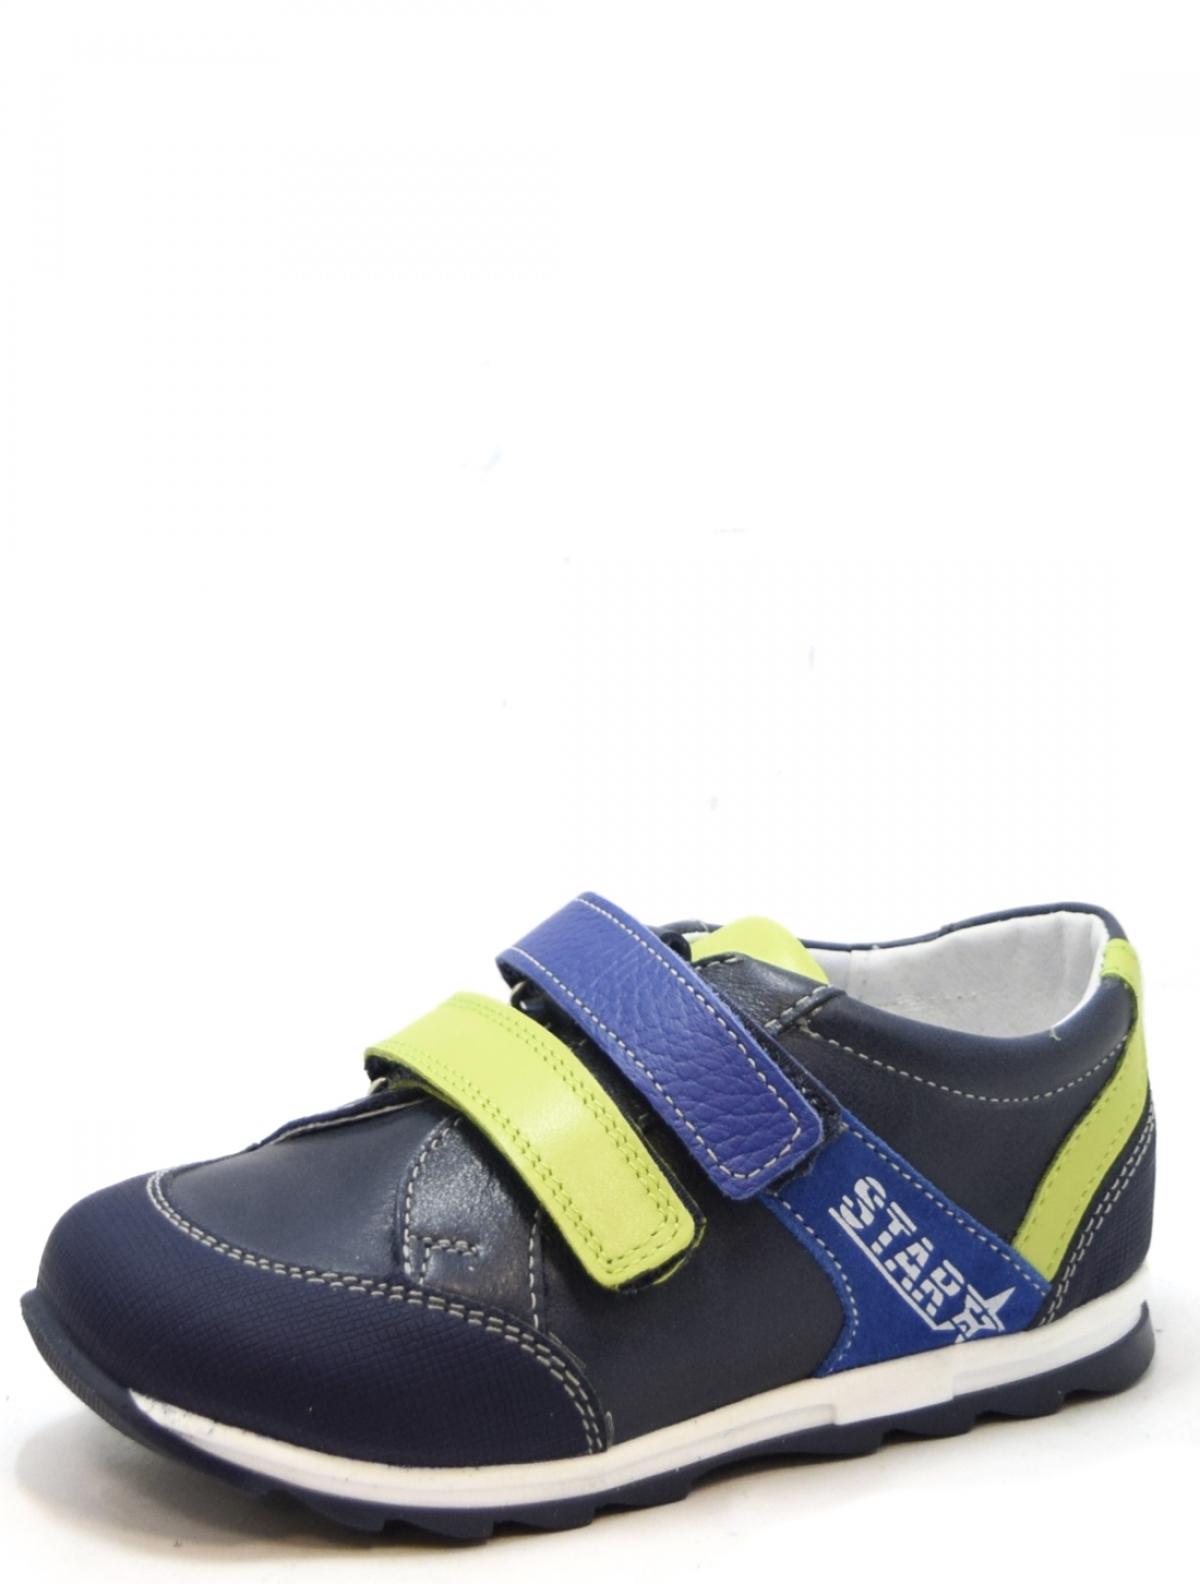 Shagovita 21133 детские туфли